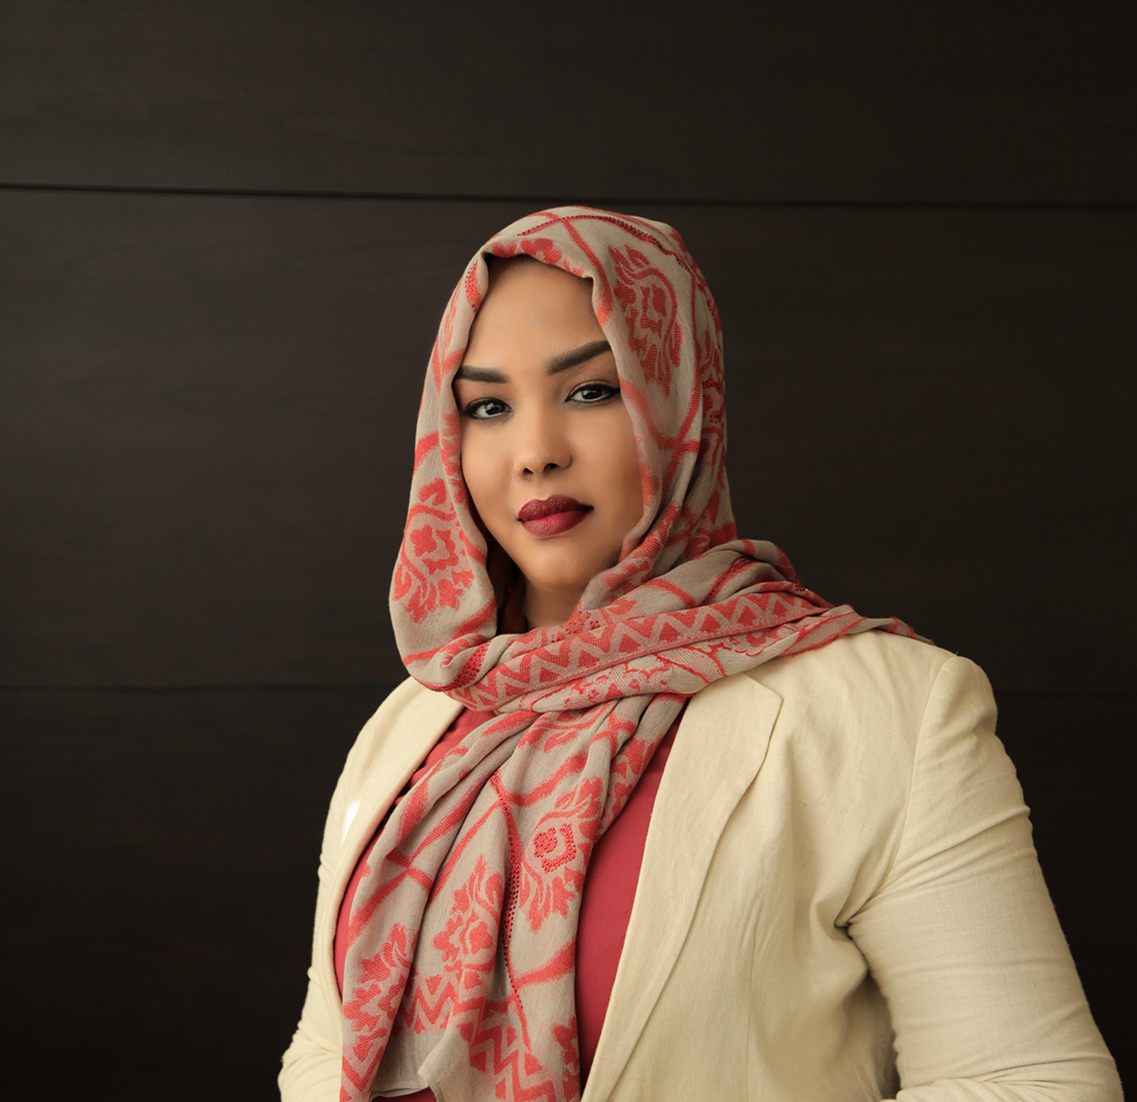 Zeinab Mhgoub Abdulla